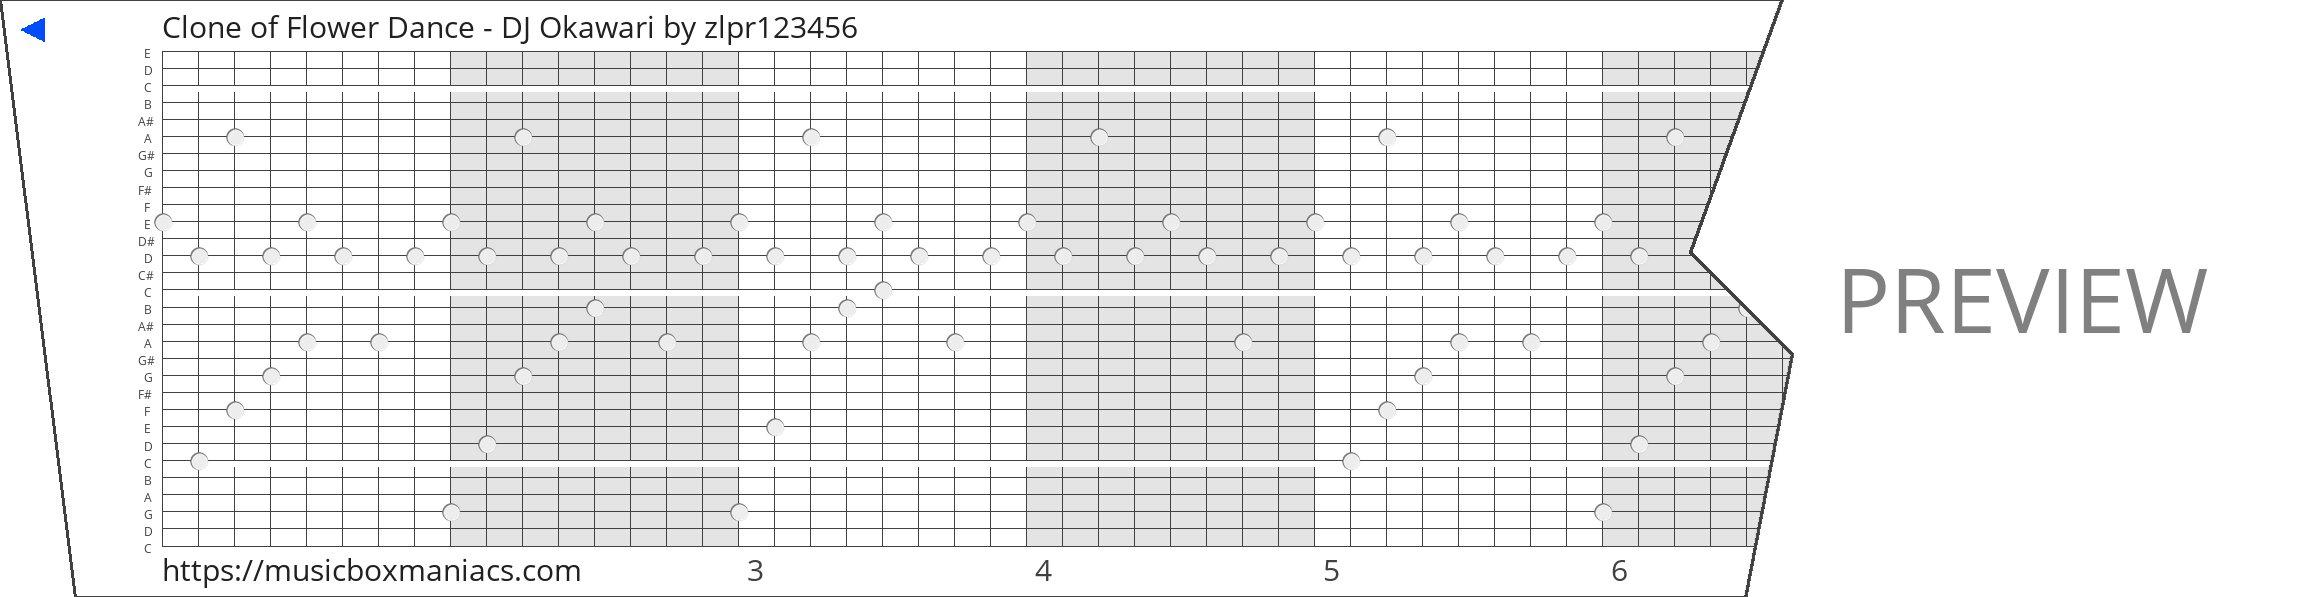 Clone of Flower Dance - DJ Okawari 30 note music box paper strip